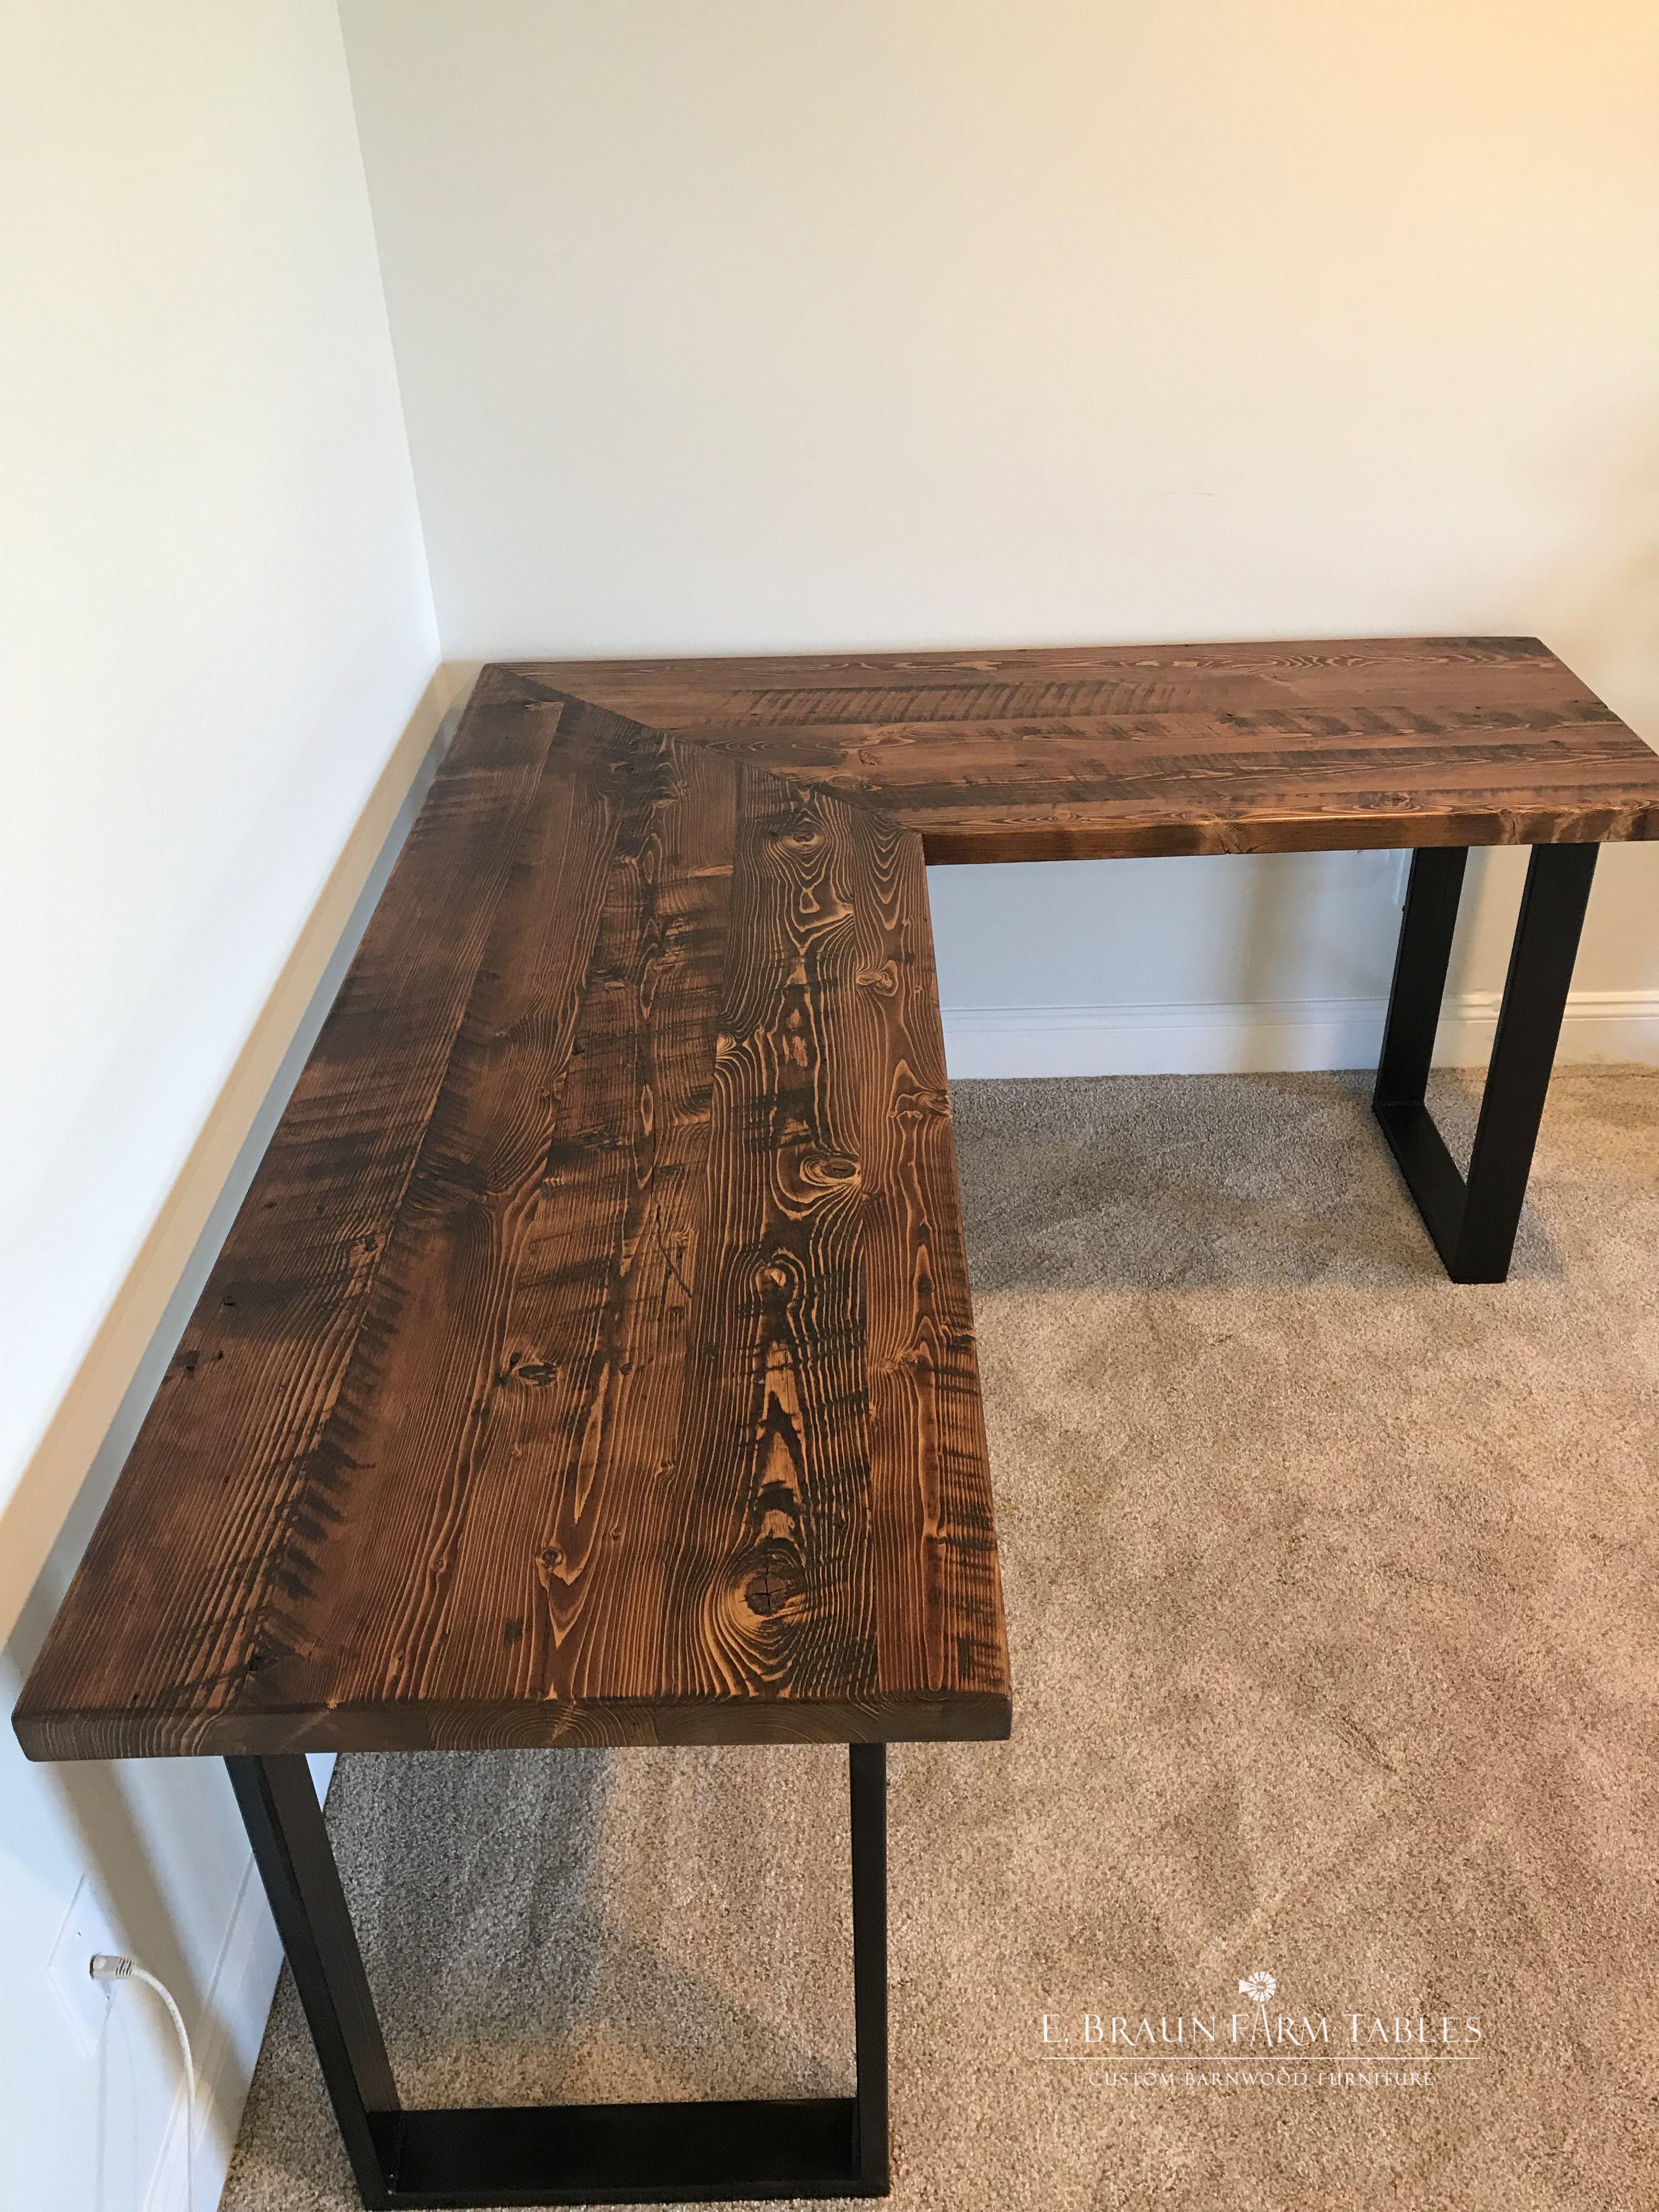 Custom Handcrafted Desk Of Reclaimed Yellow Pine Barn Wood Boards